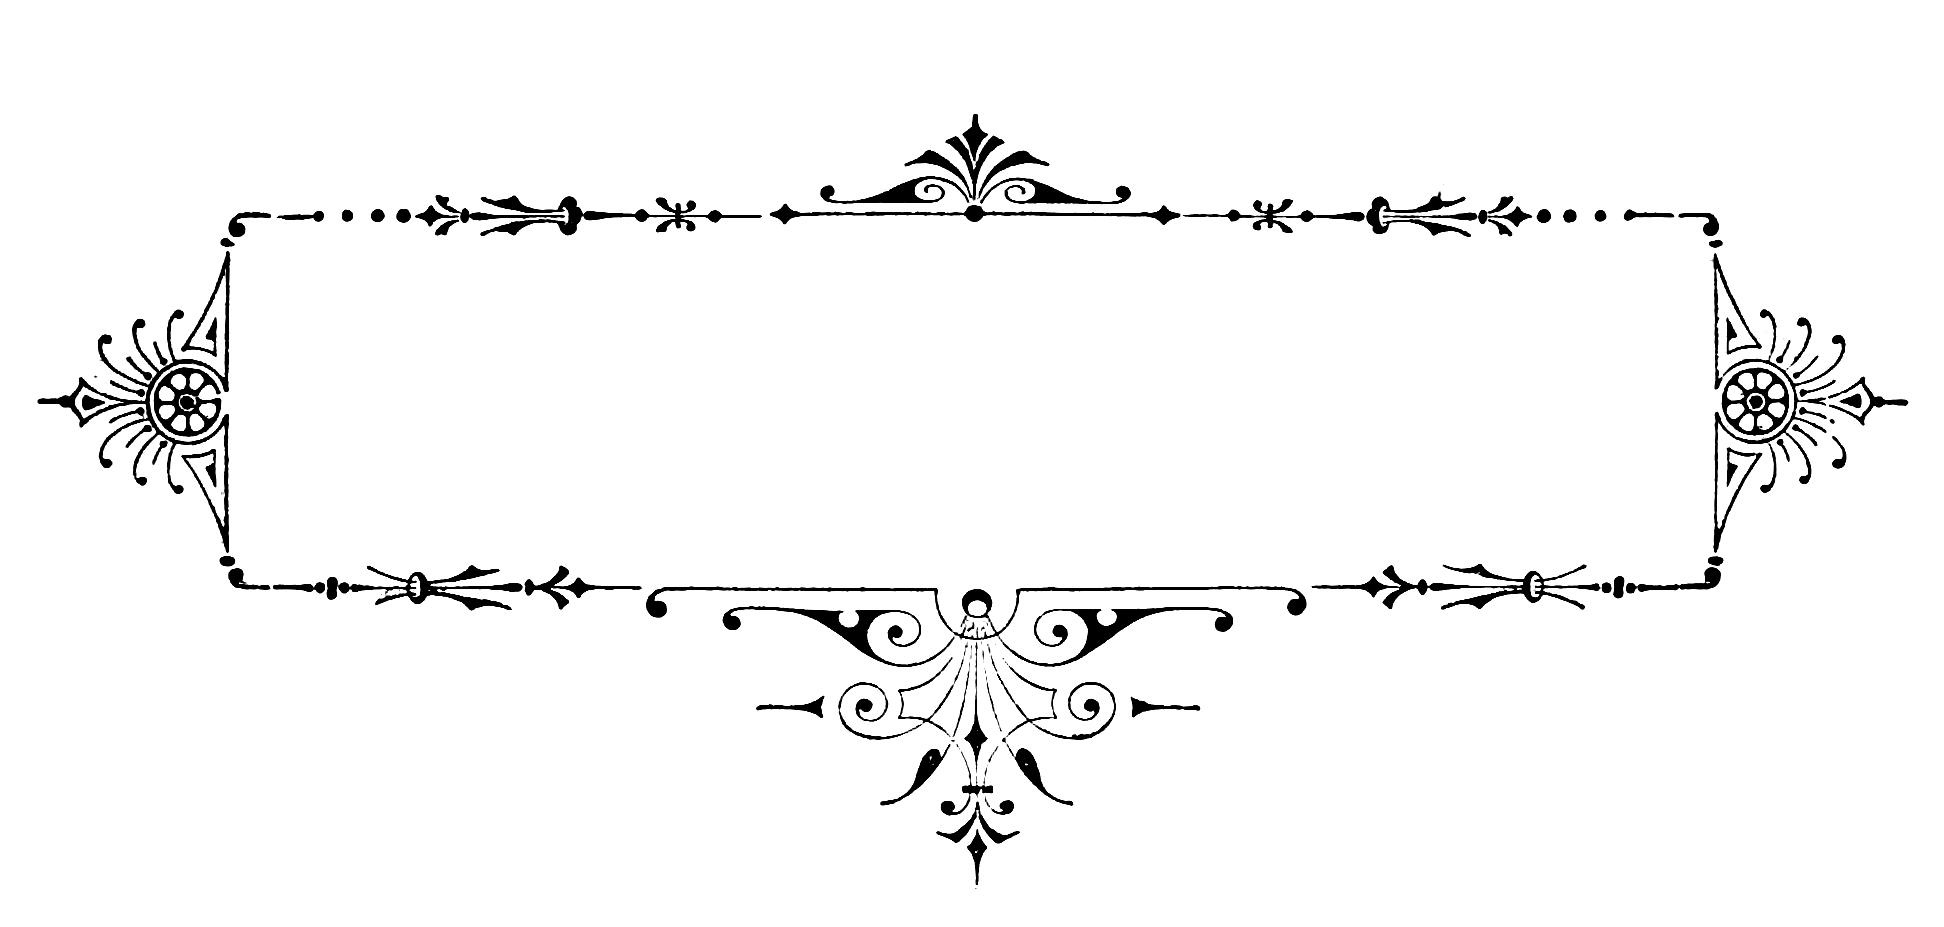 Clipart, design elements for label designing on.